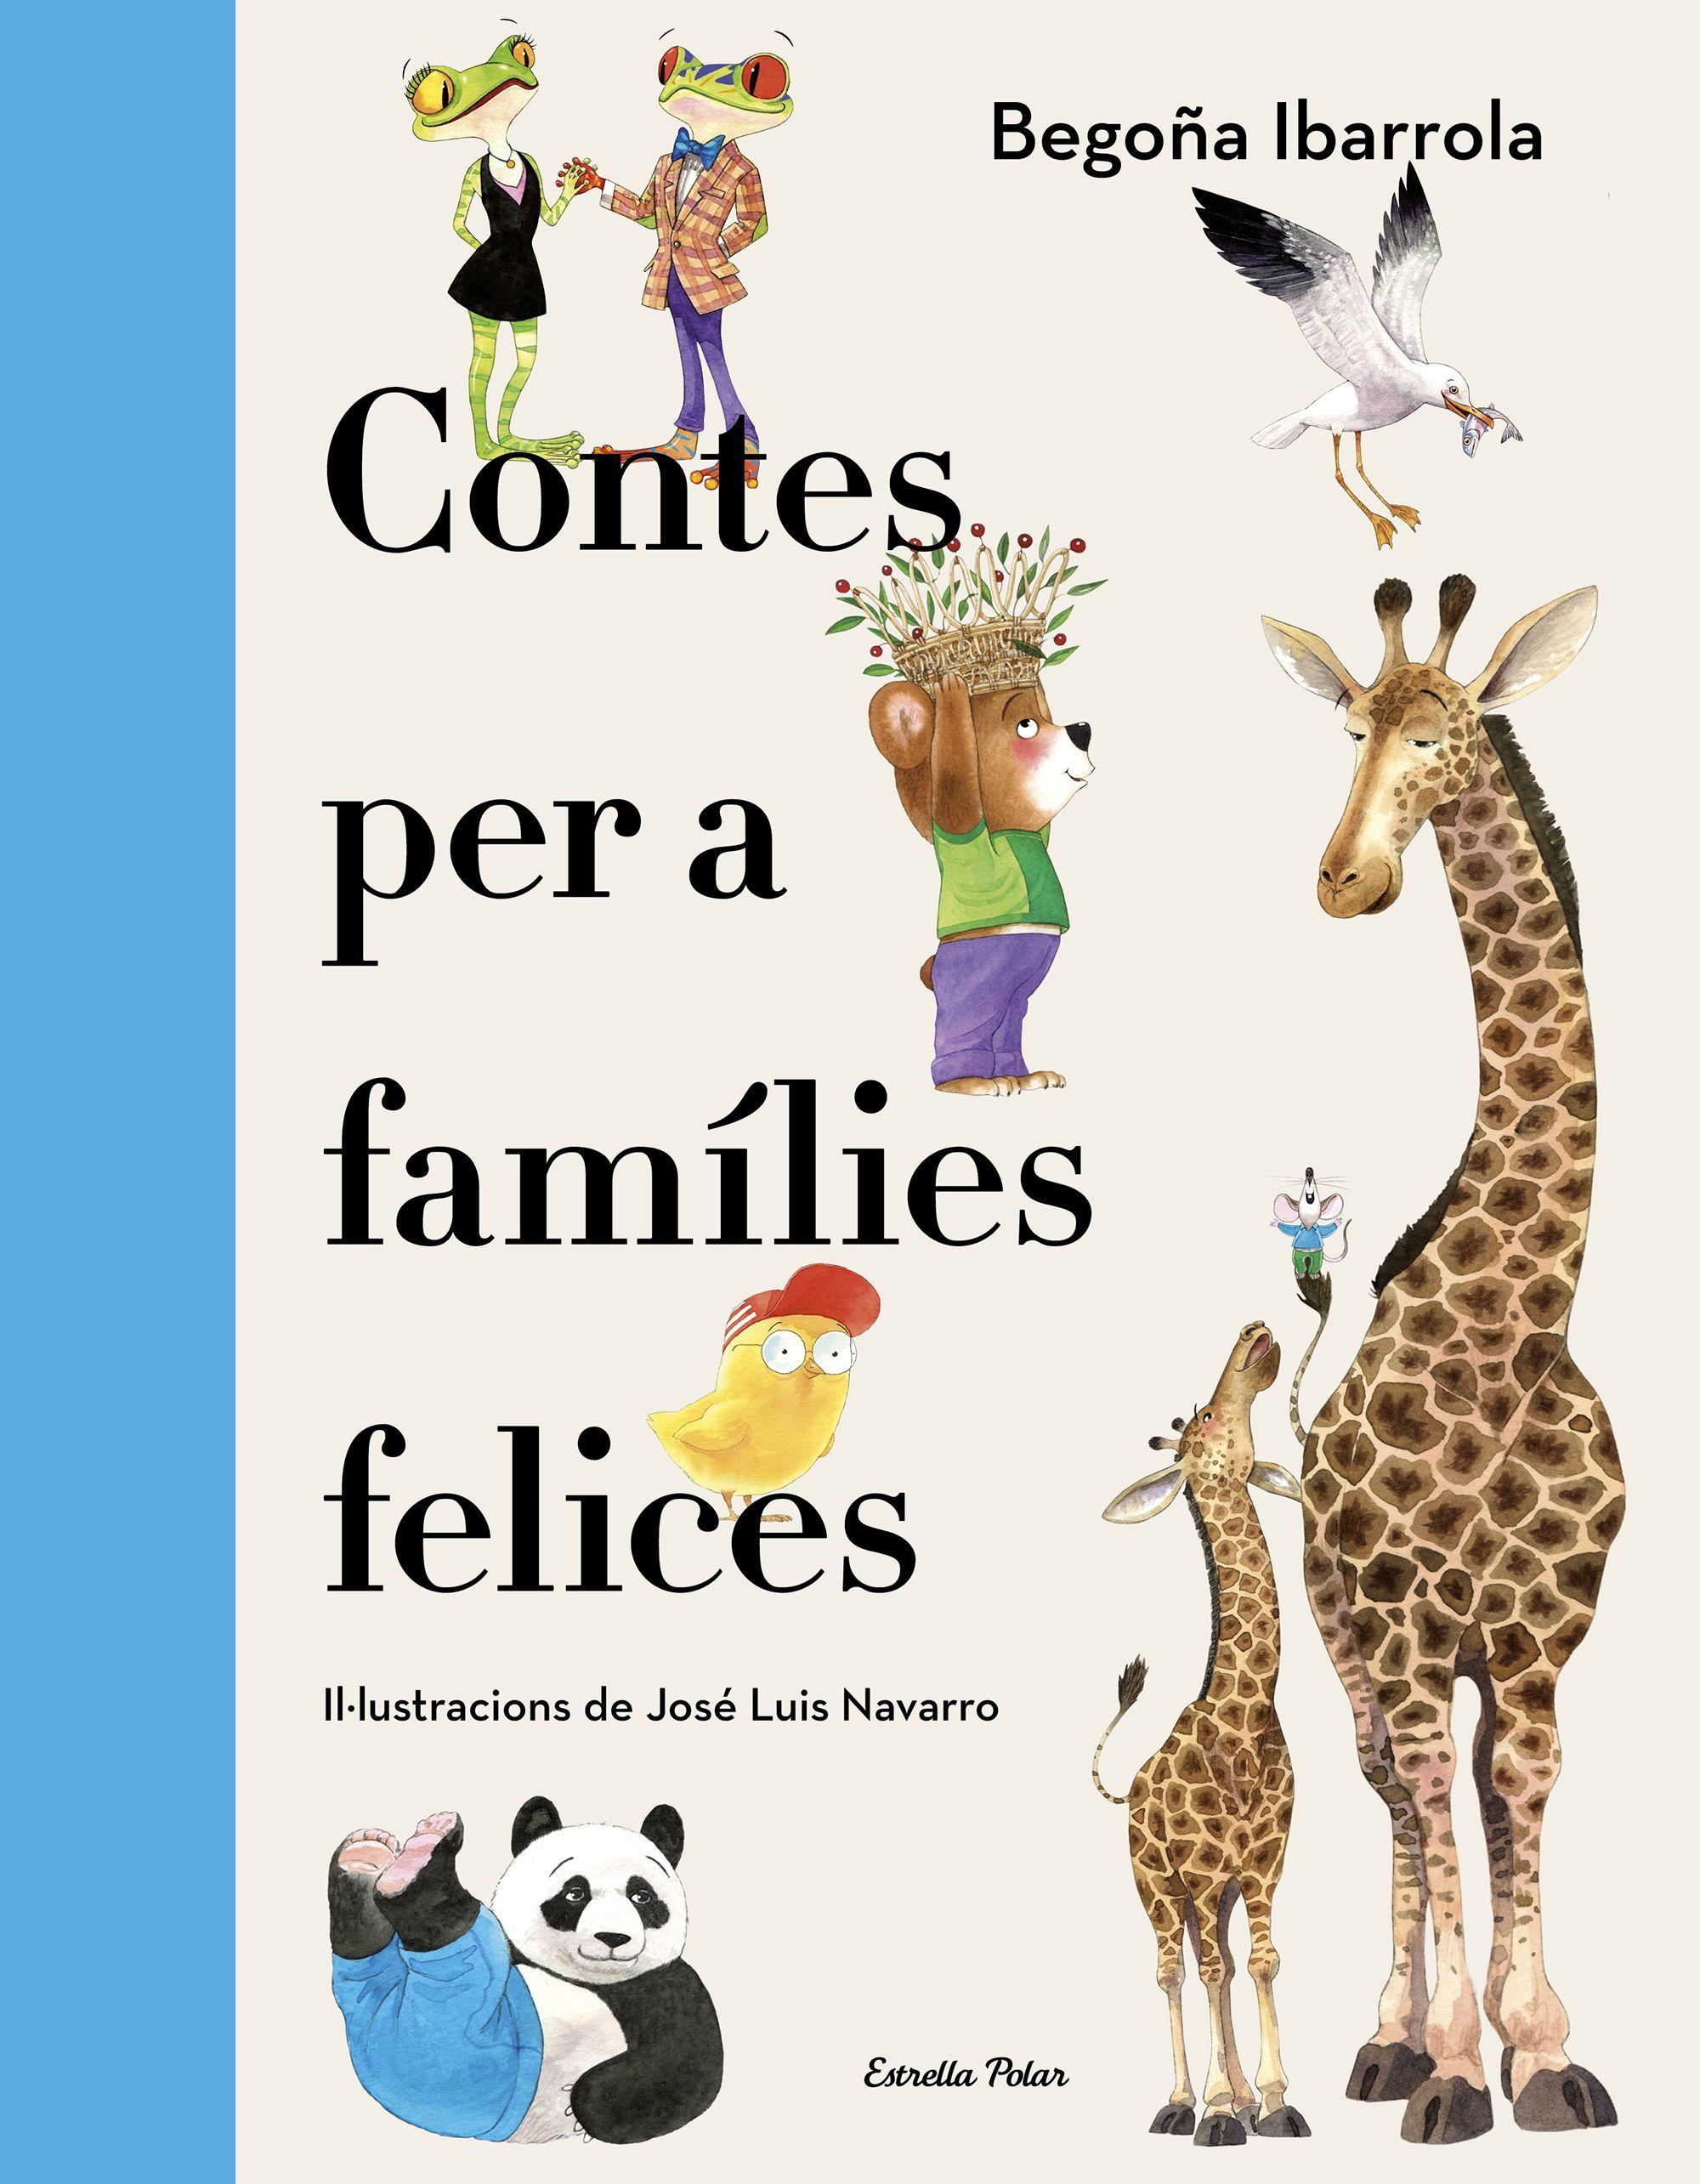 CONTES PER A FAMILIES FELICES